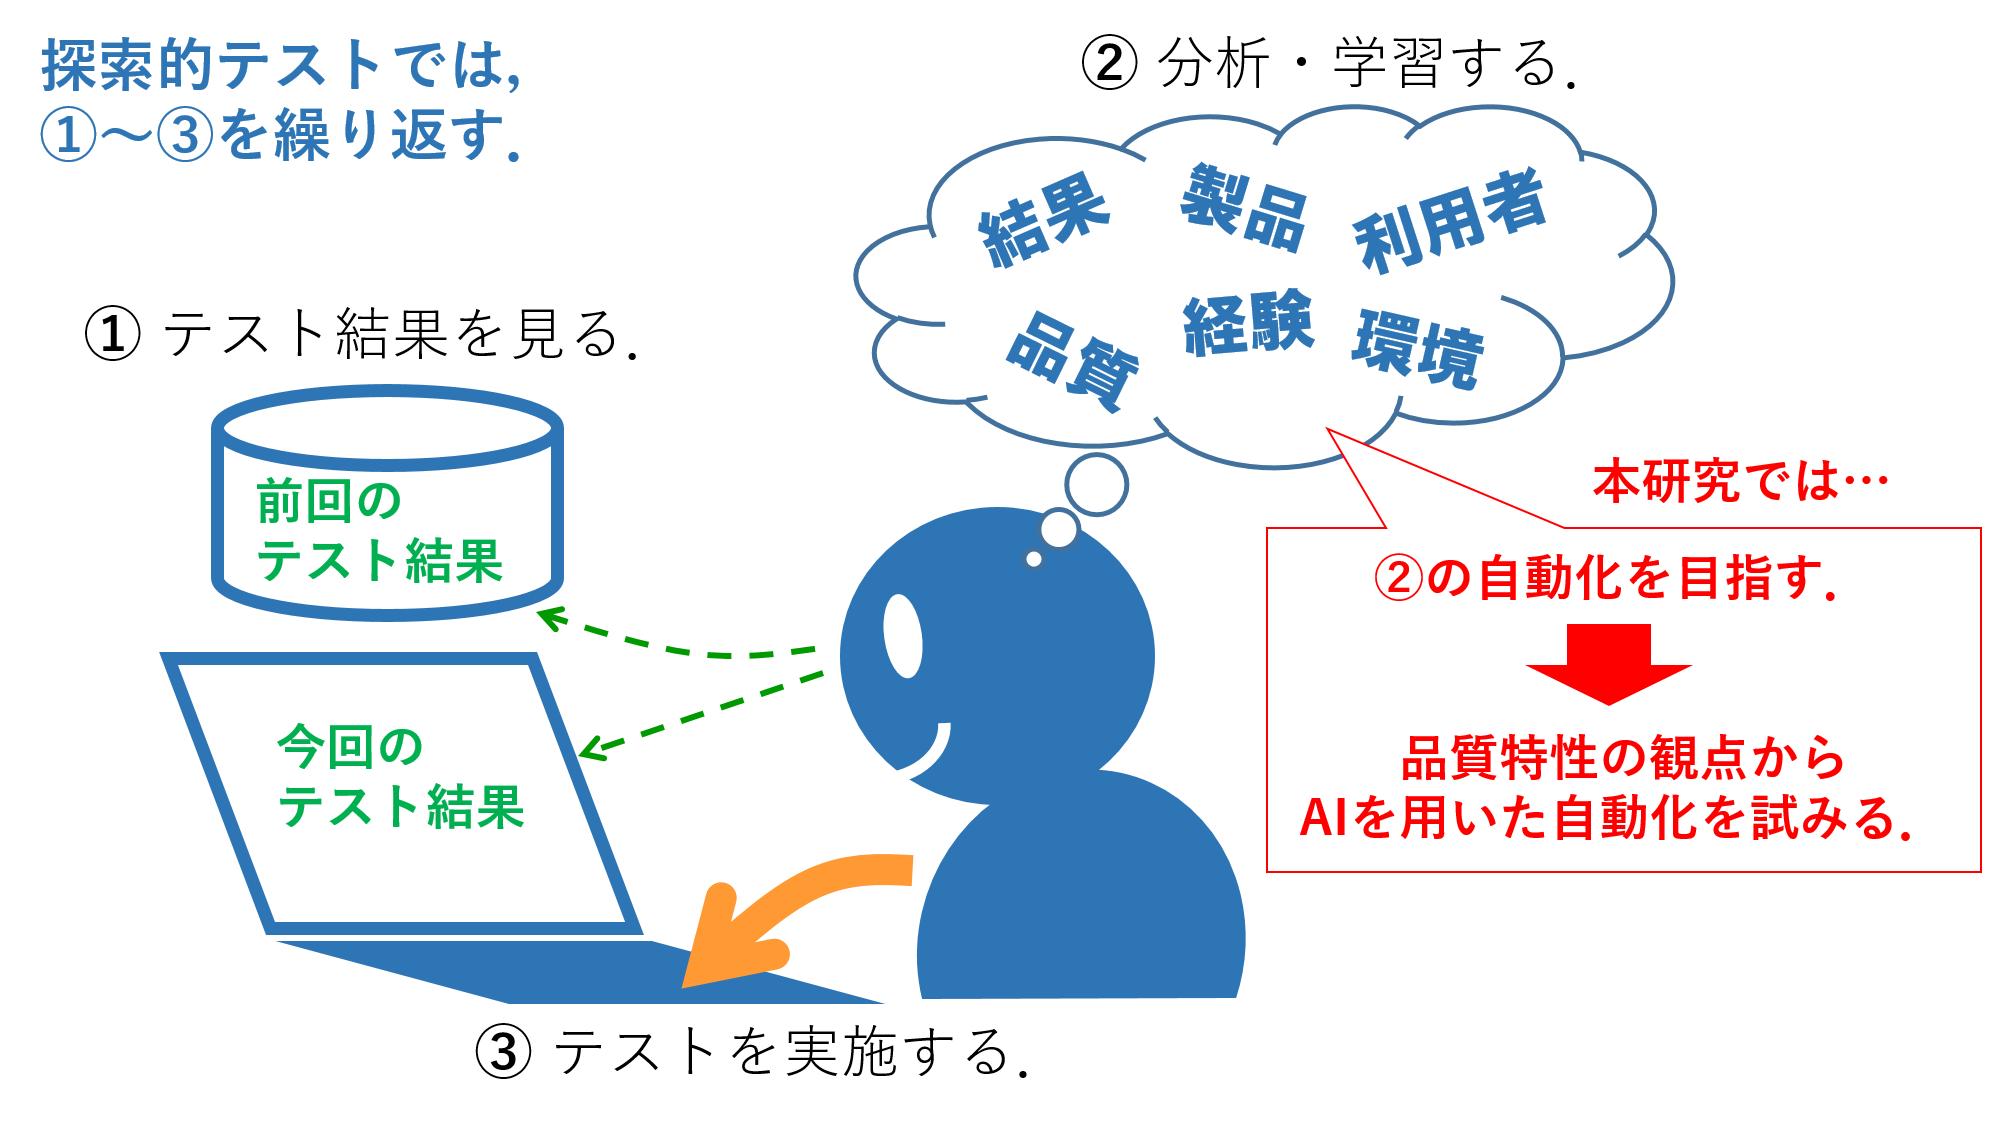 AIを活用したソフトウェアテストの手法を開発へ 日本ナレッジ(株)と連携、品質特性ごとに不具合を分類・解析 -- 東京工科大学コンピュータサイエンス学部